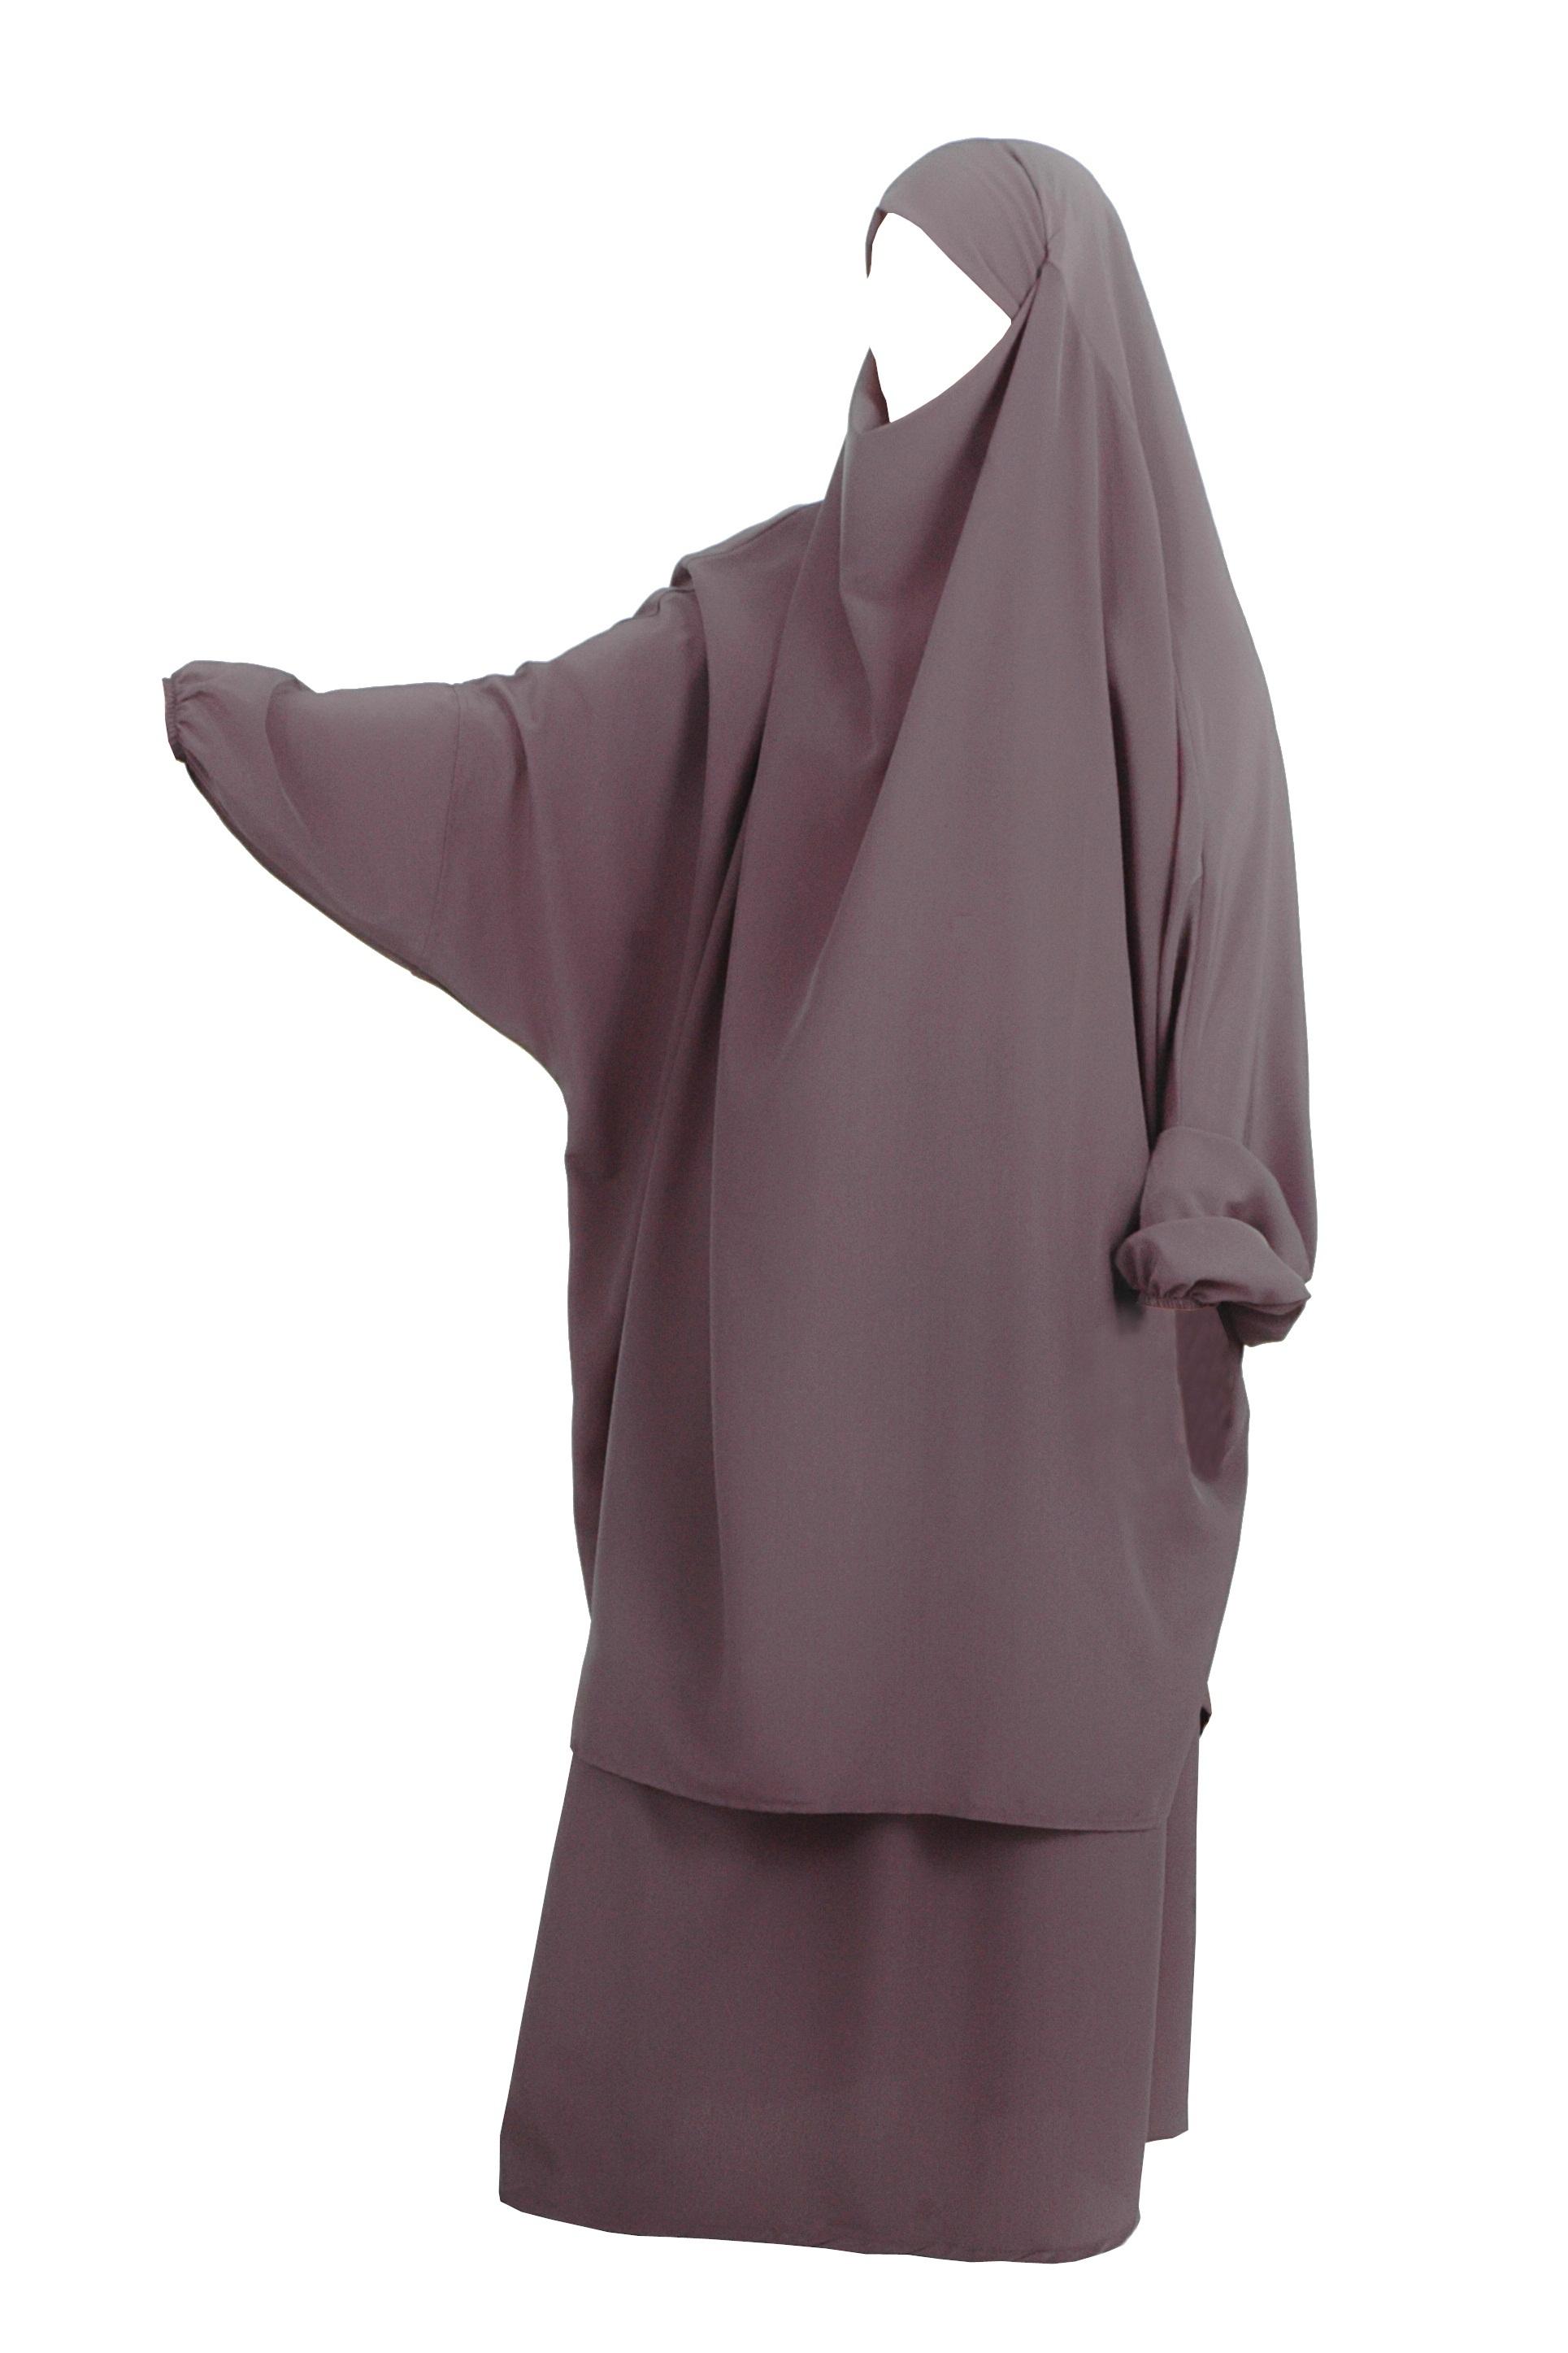 tag vetement islamique